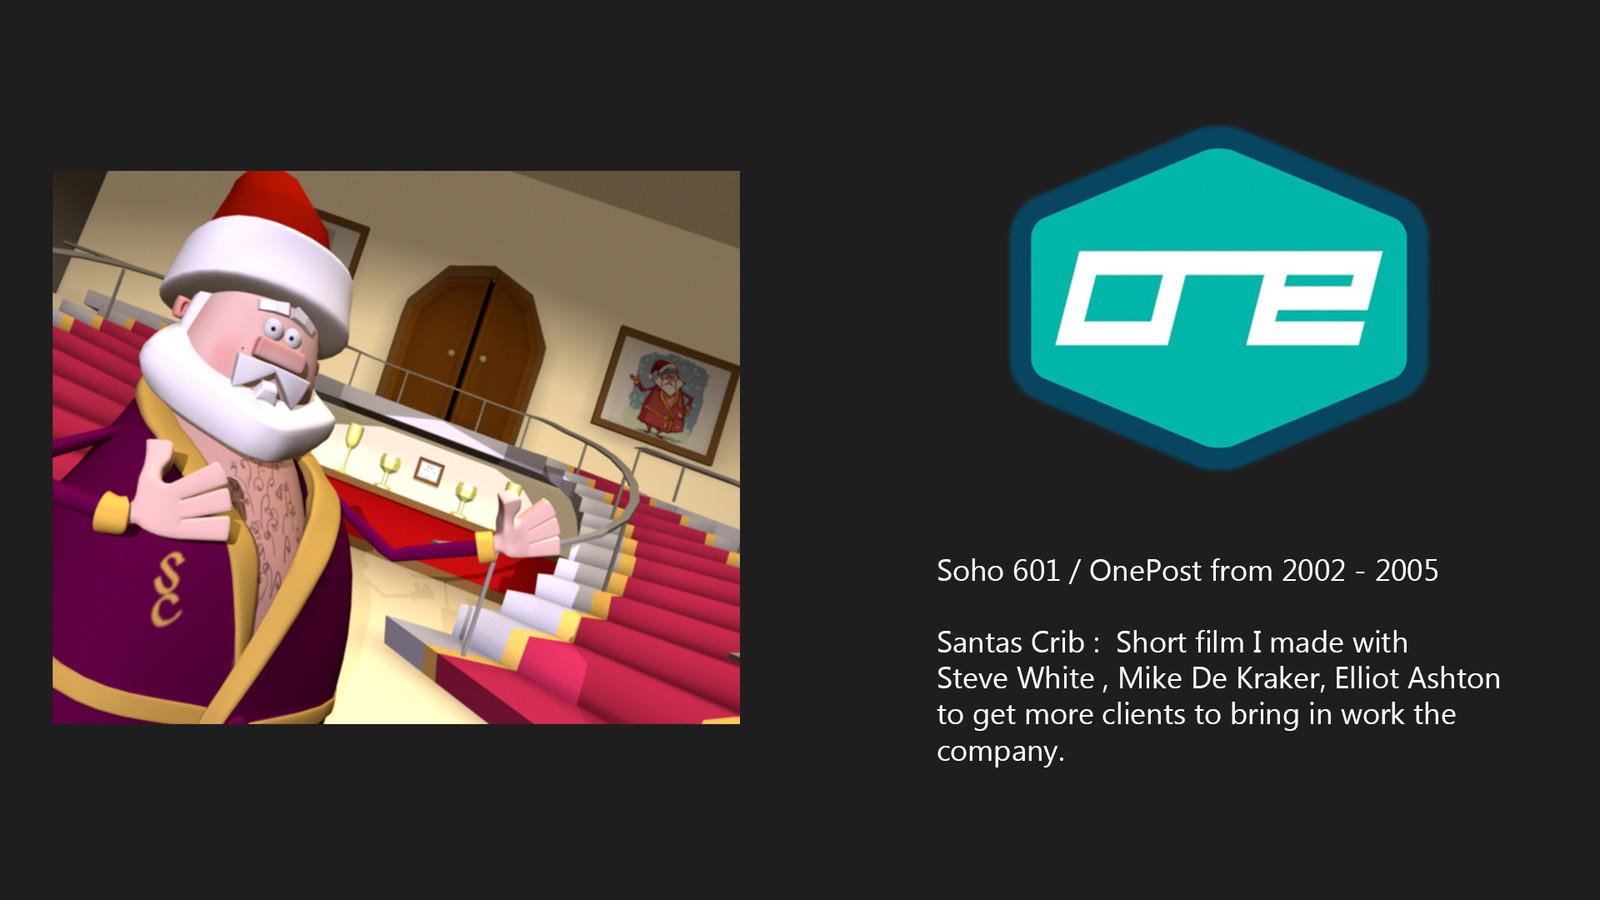 Soho 601 / OnePost  :  Santas Crib